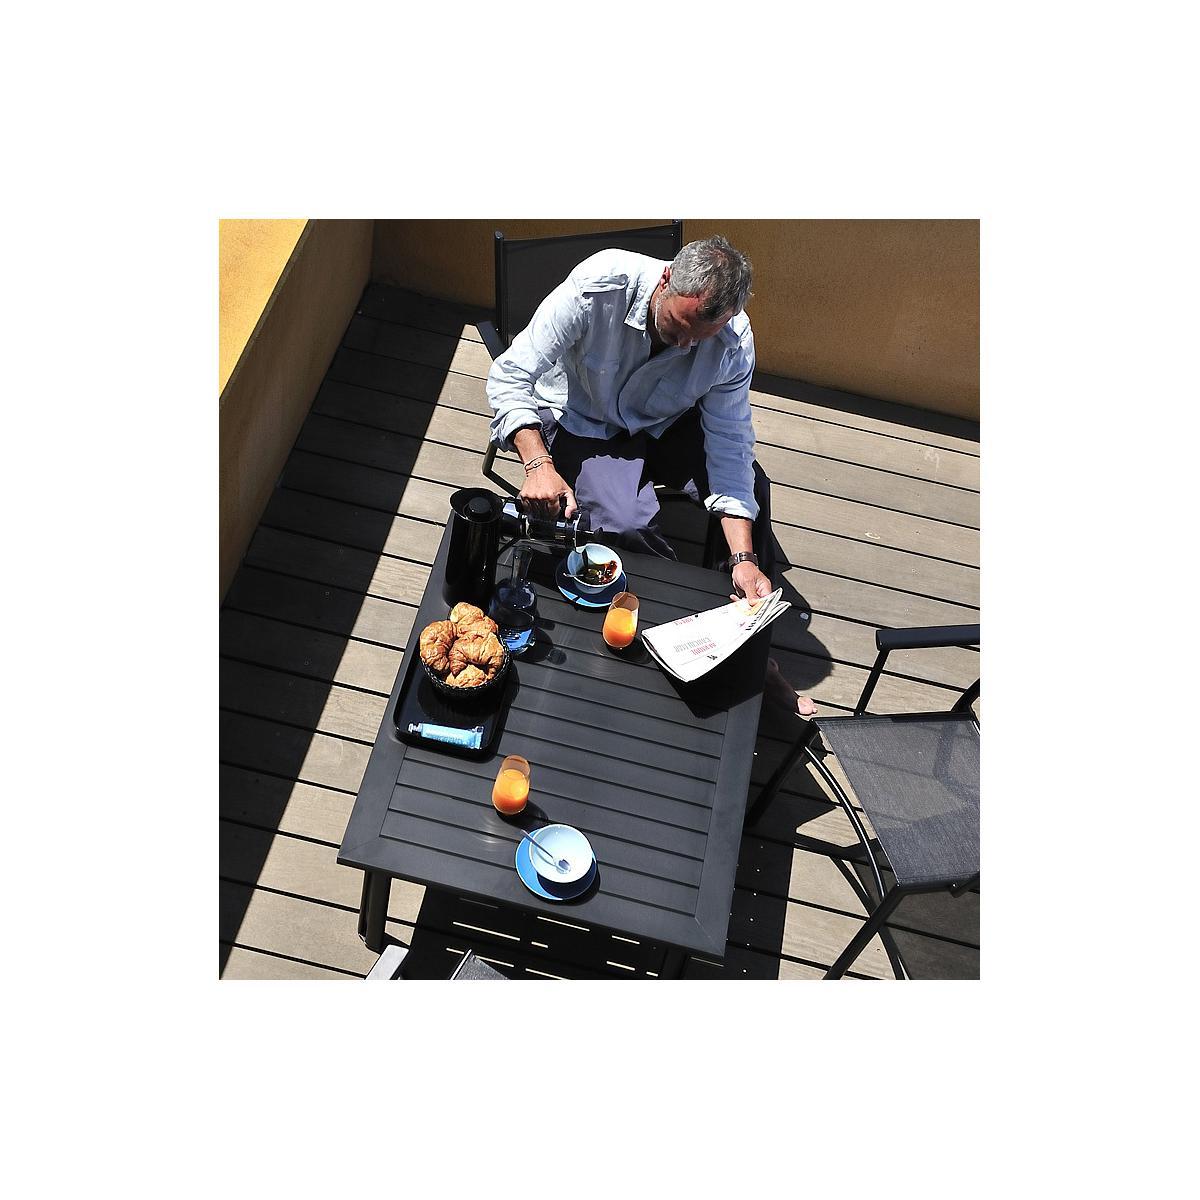 COSTA by Fermob Table basse Noir réglisse